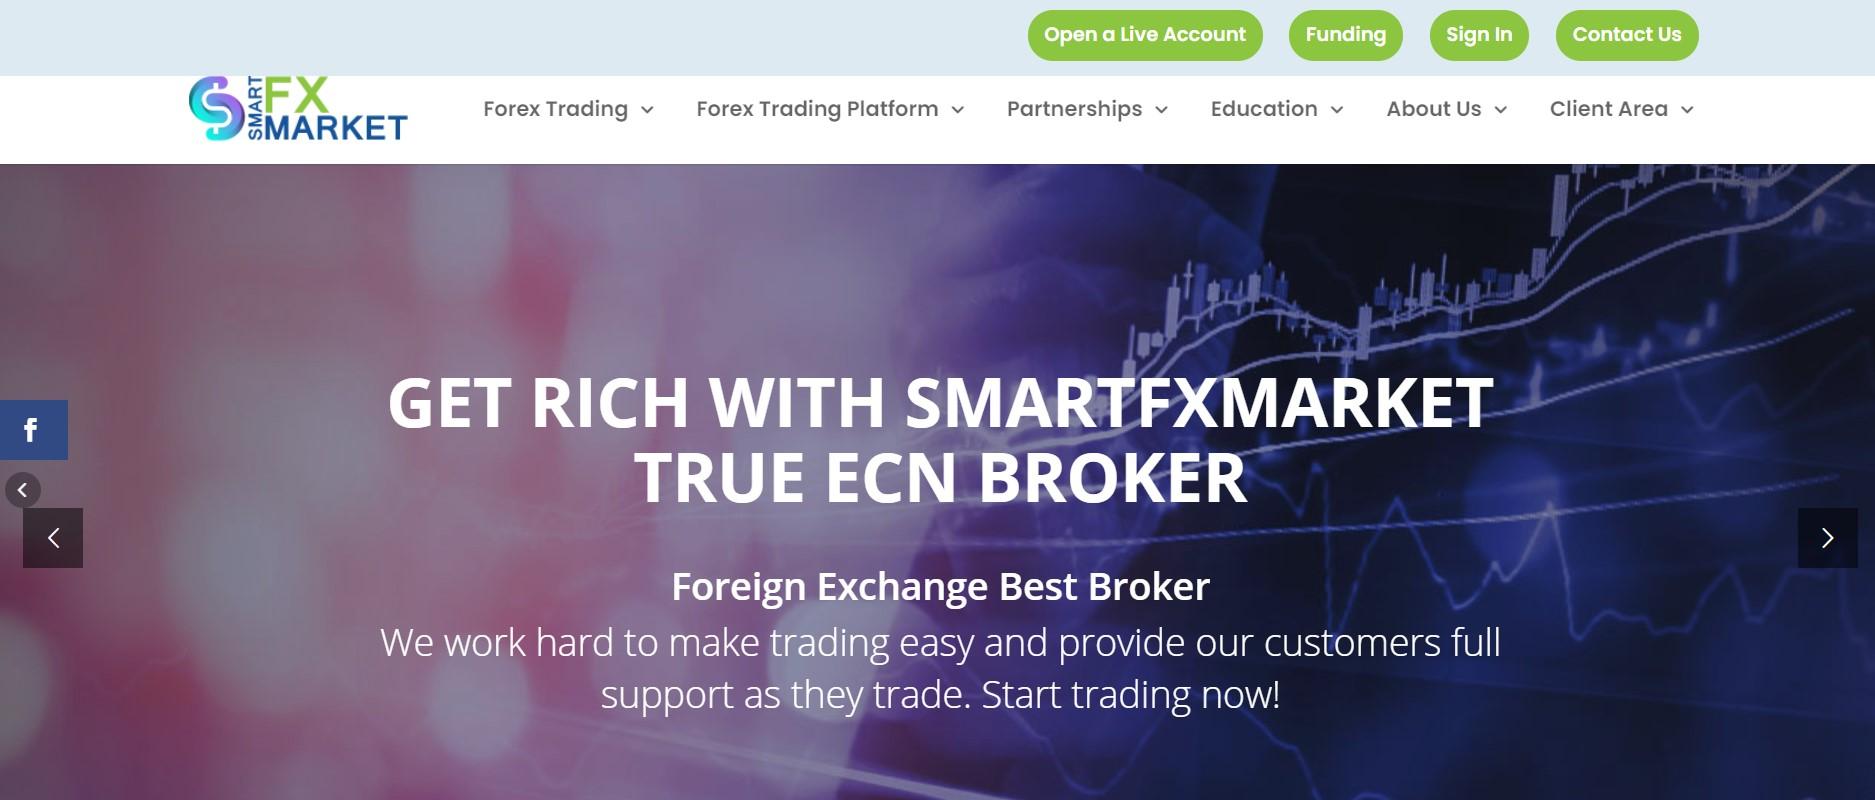 SmartFX Market website